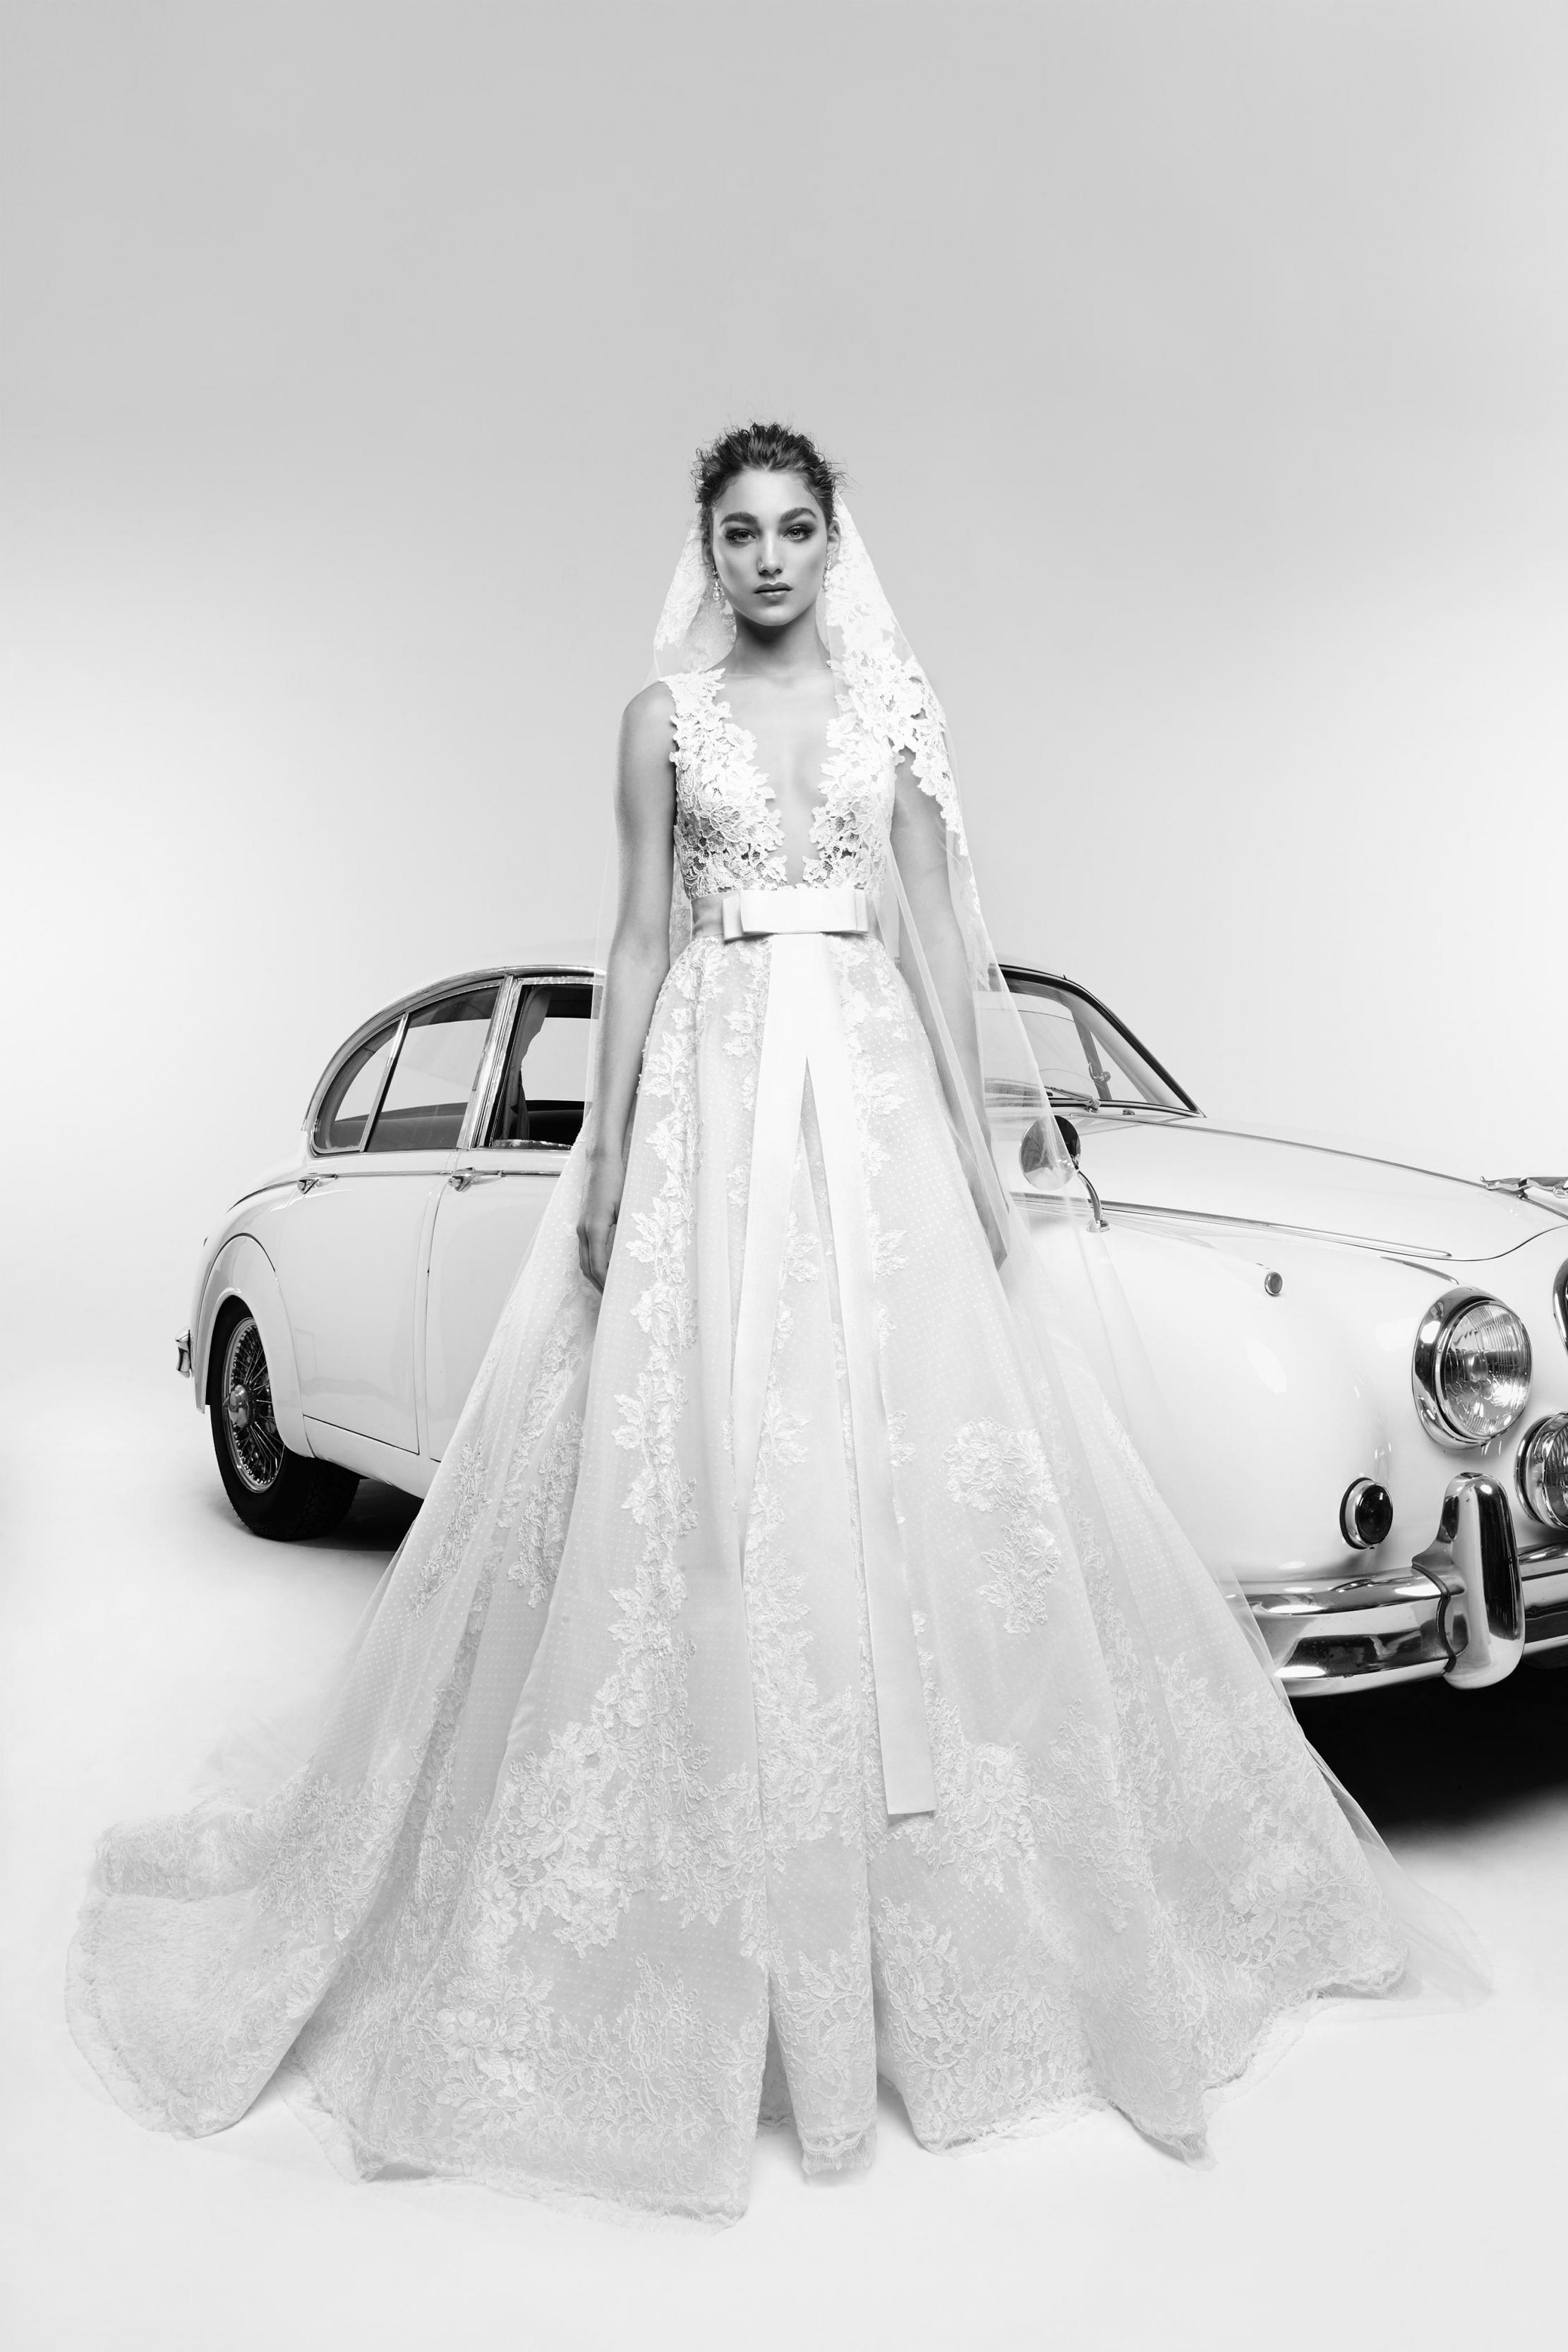 بالصور فساتين زفاف زهير مراد 2019 , فساتين زفاف زهير مراد واجمد فساتين 5814 14